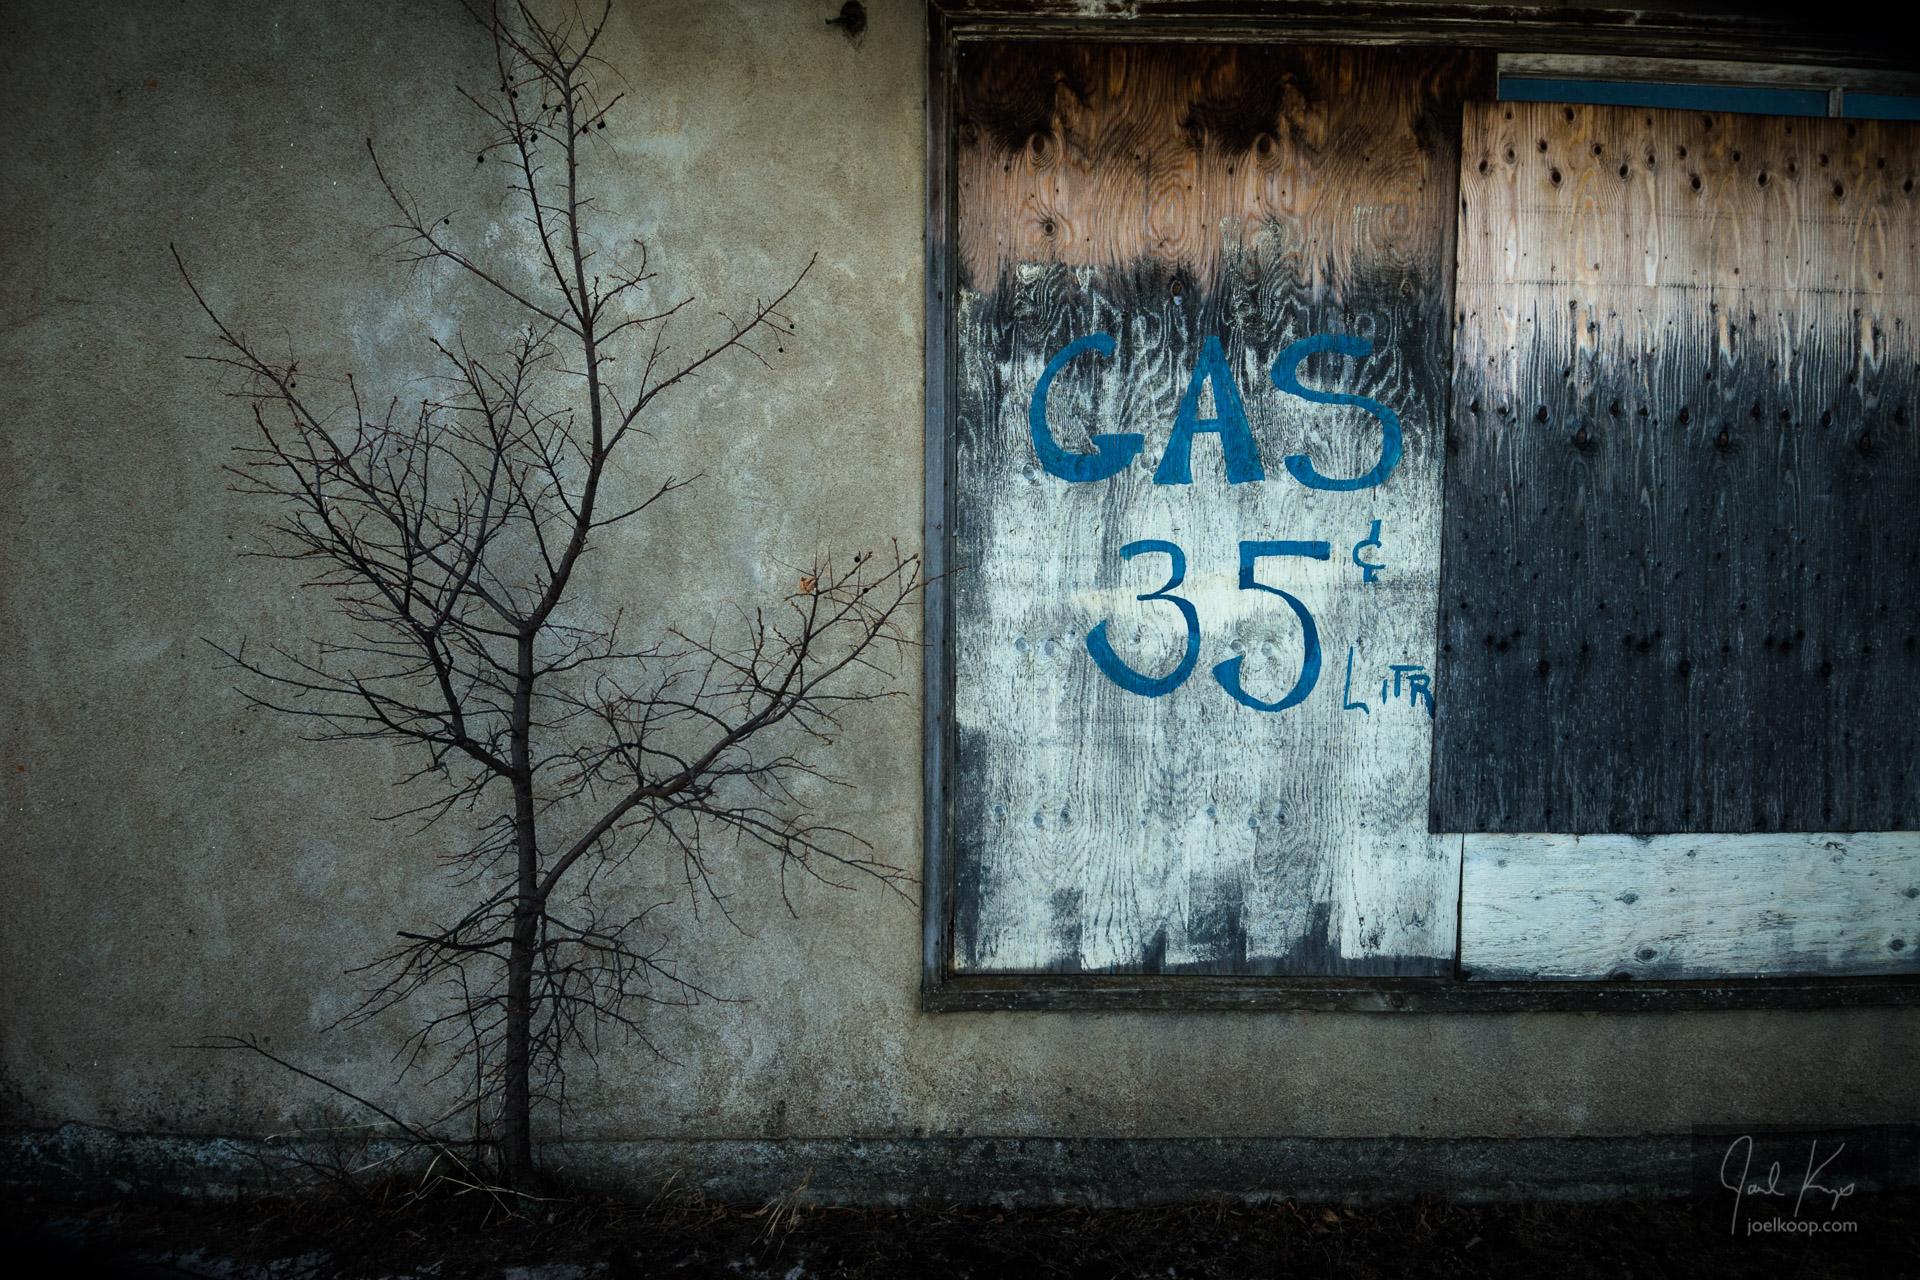 Gas 35c